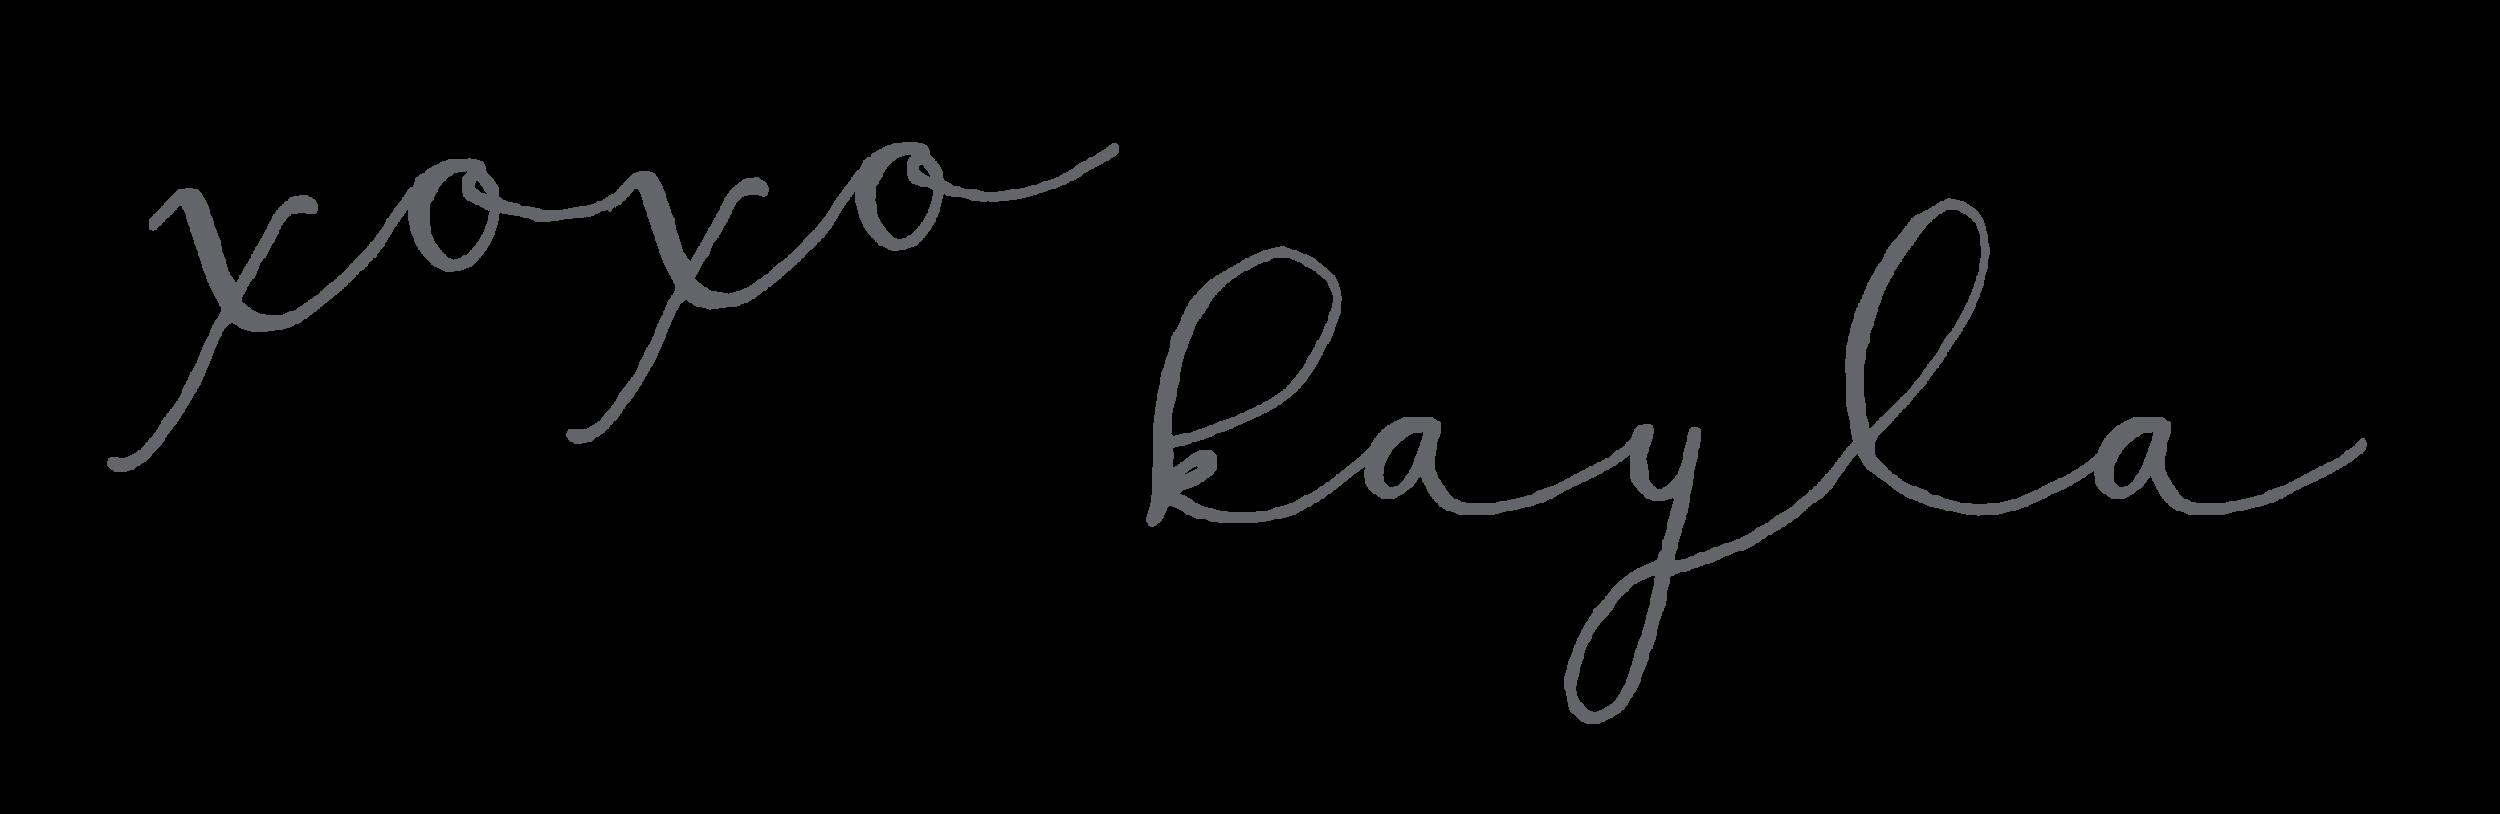 XOXO - Signature GIFT for Kayla.png